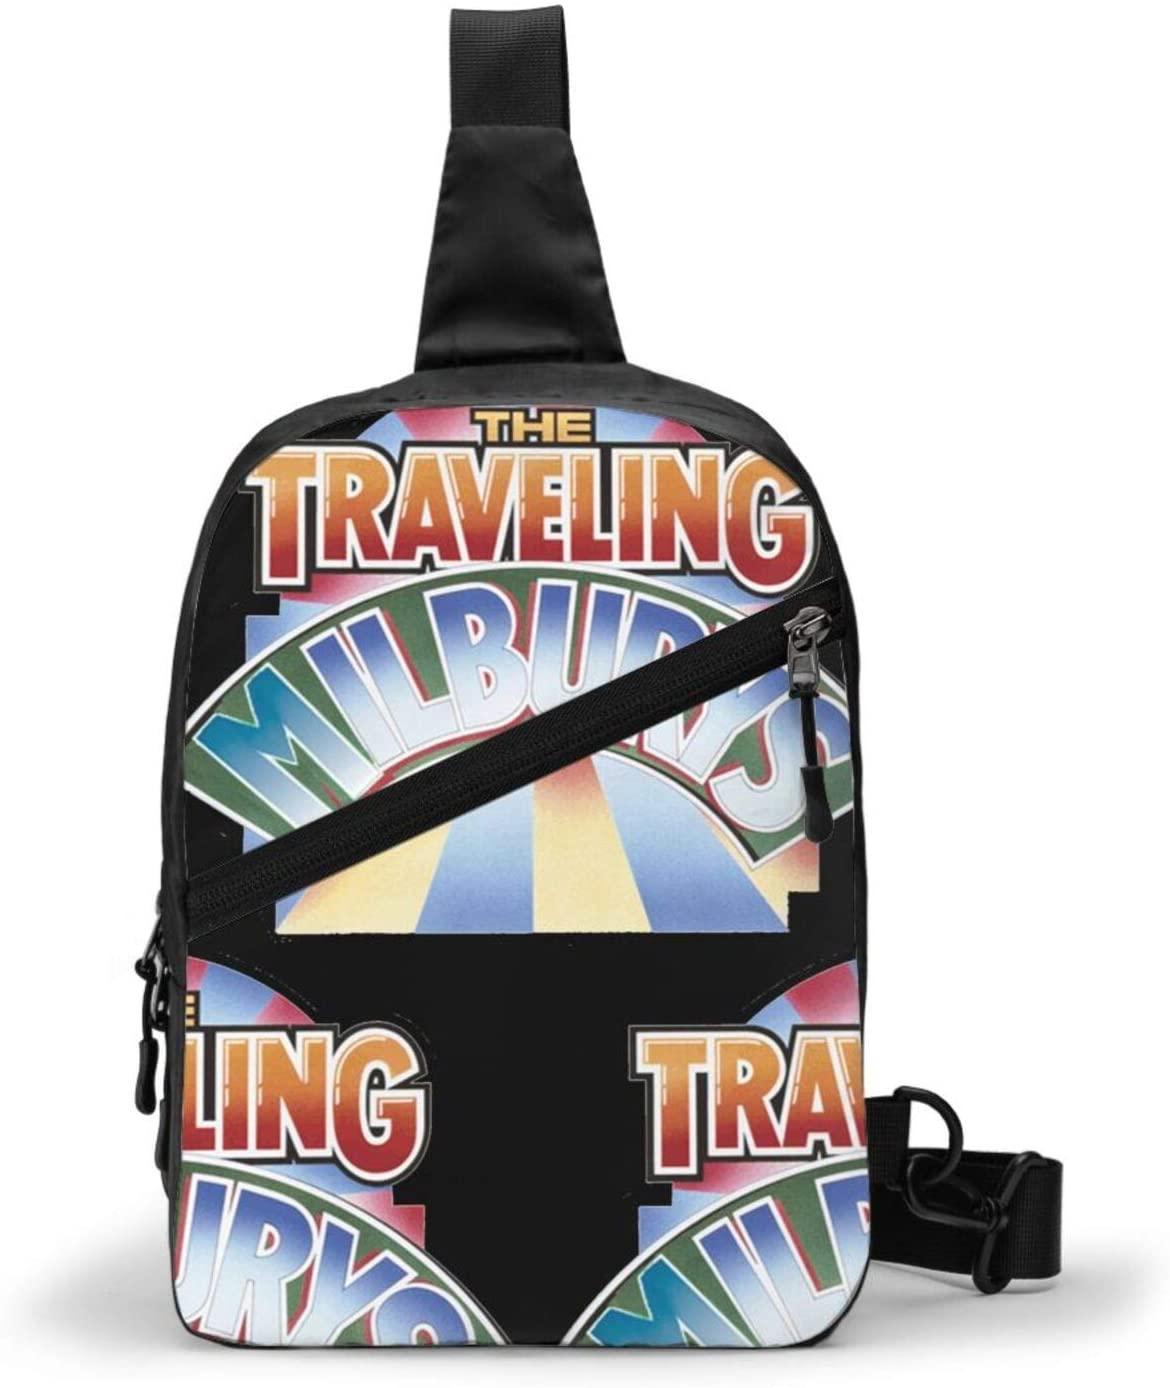 Traveling Wilburys Fashion Crossbody Sling Backpack Sling Bag Travel Hiking Folding Chest Bag